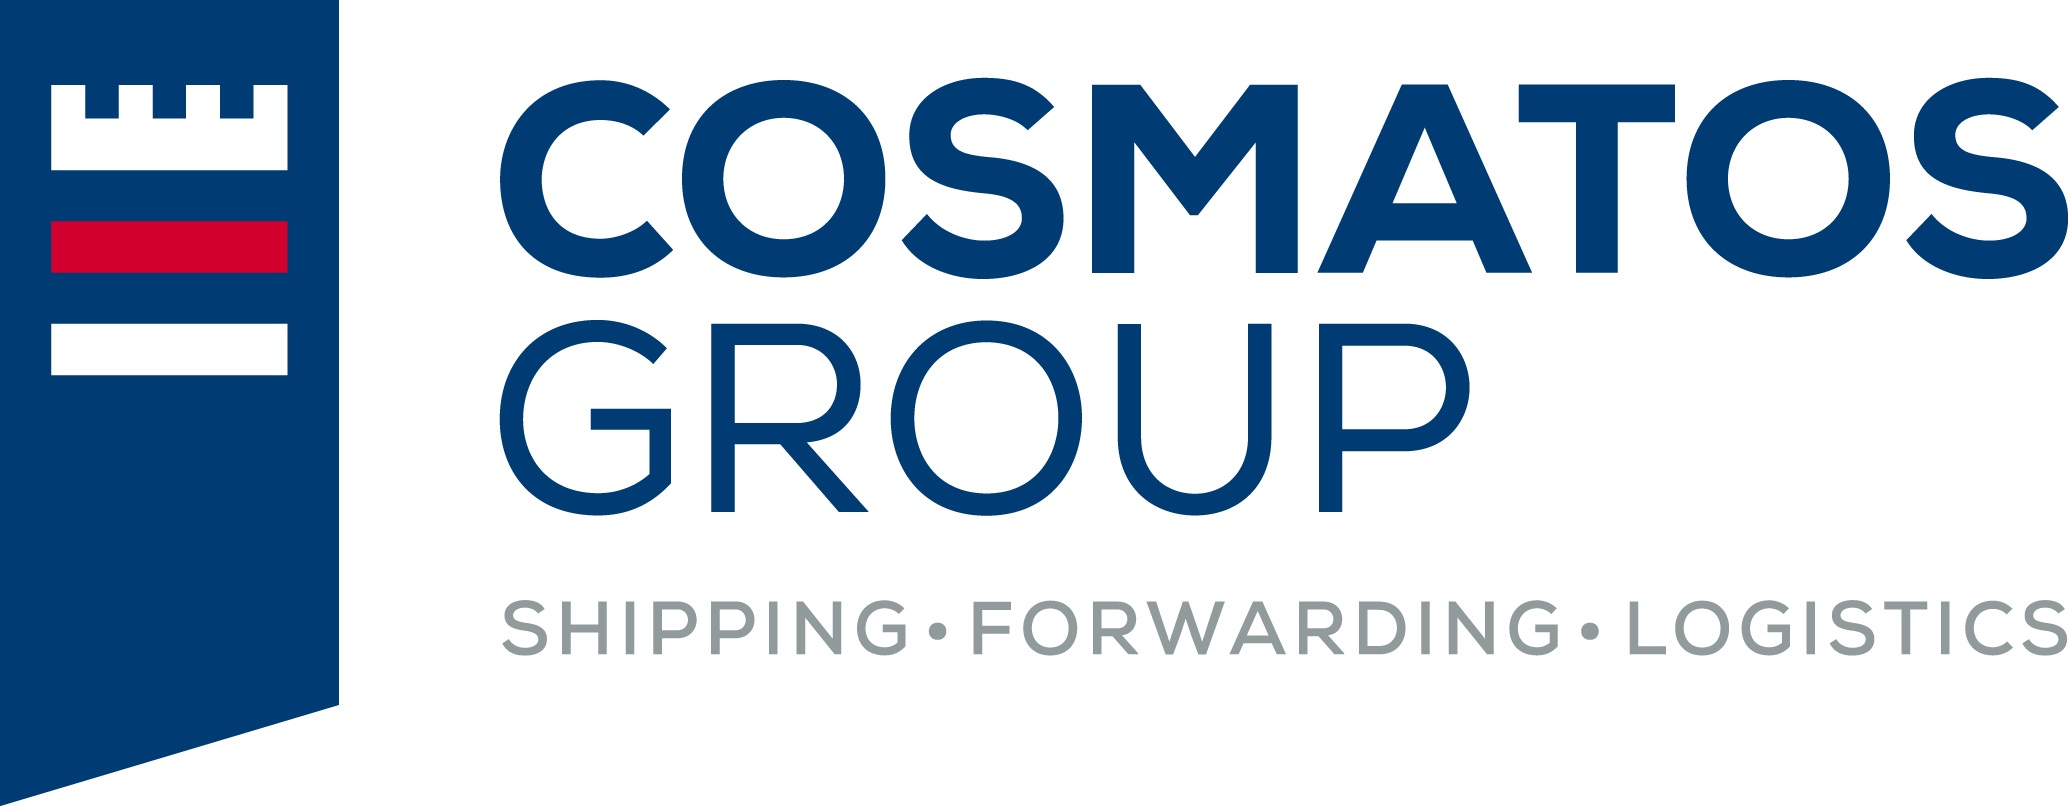 cosmatosgroup_large